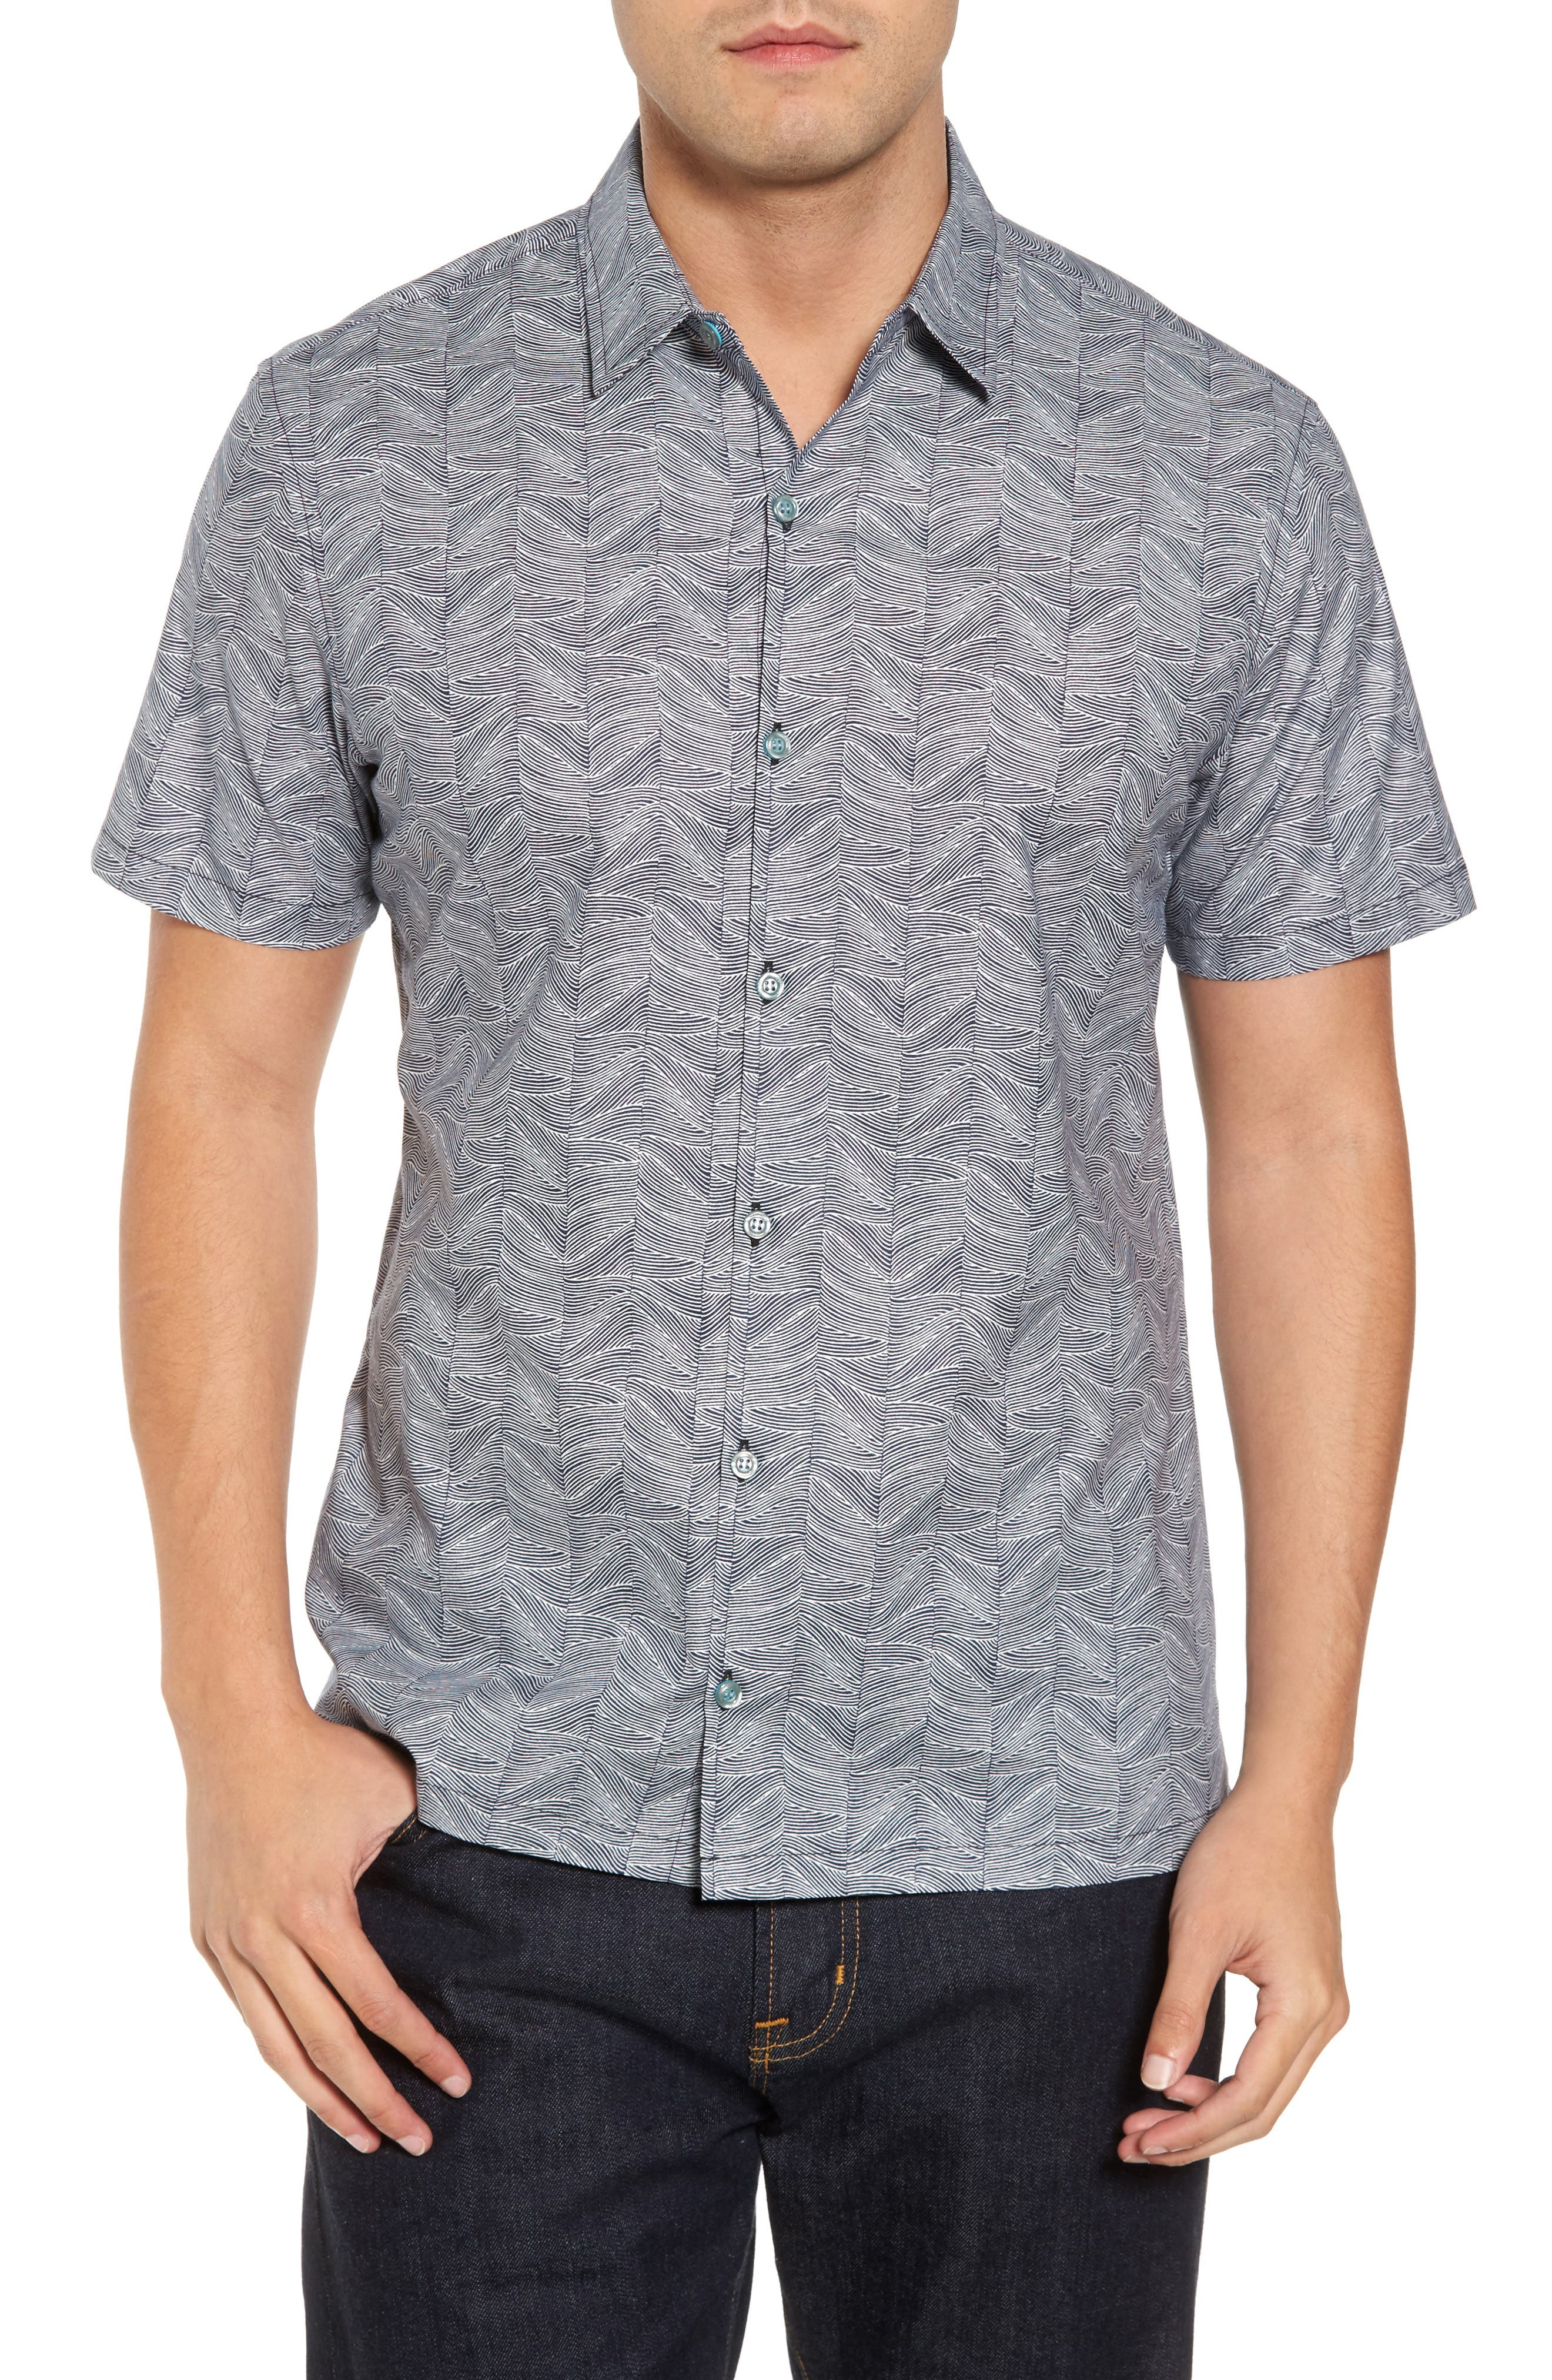 Alternate Image 1 Selected - Tori Richard Vertigo Trim Fit Print Sport Shirt